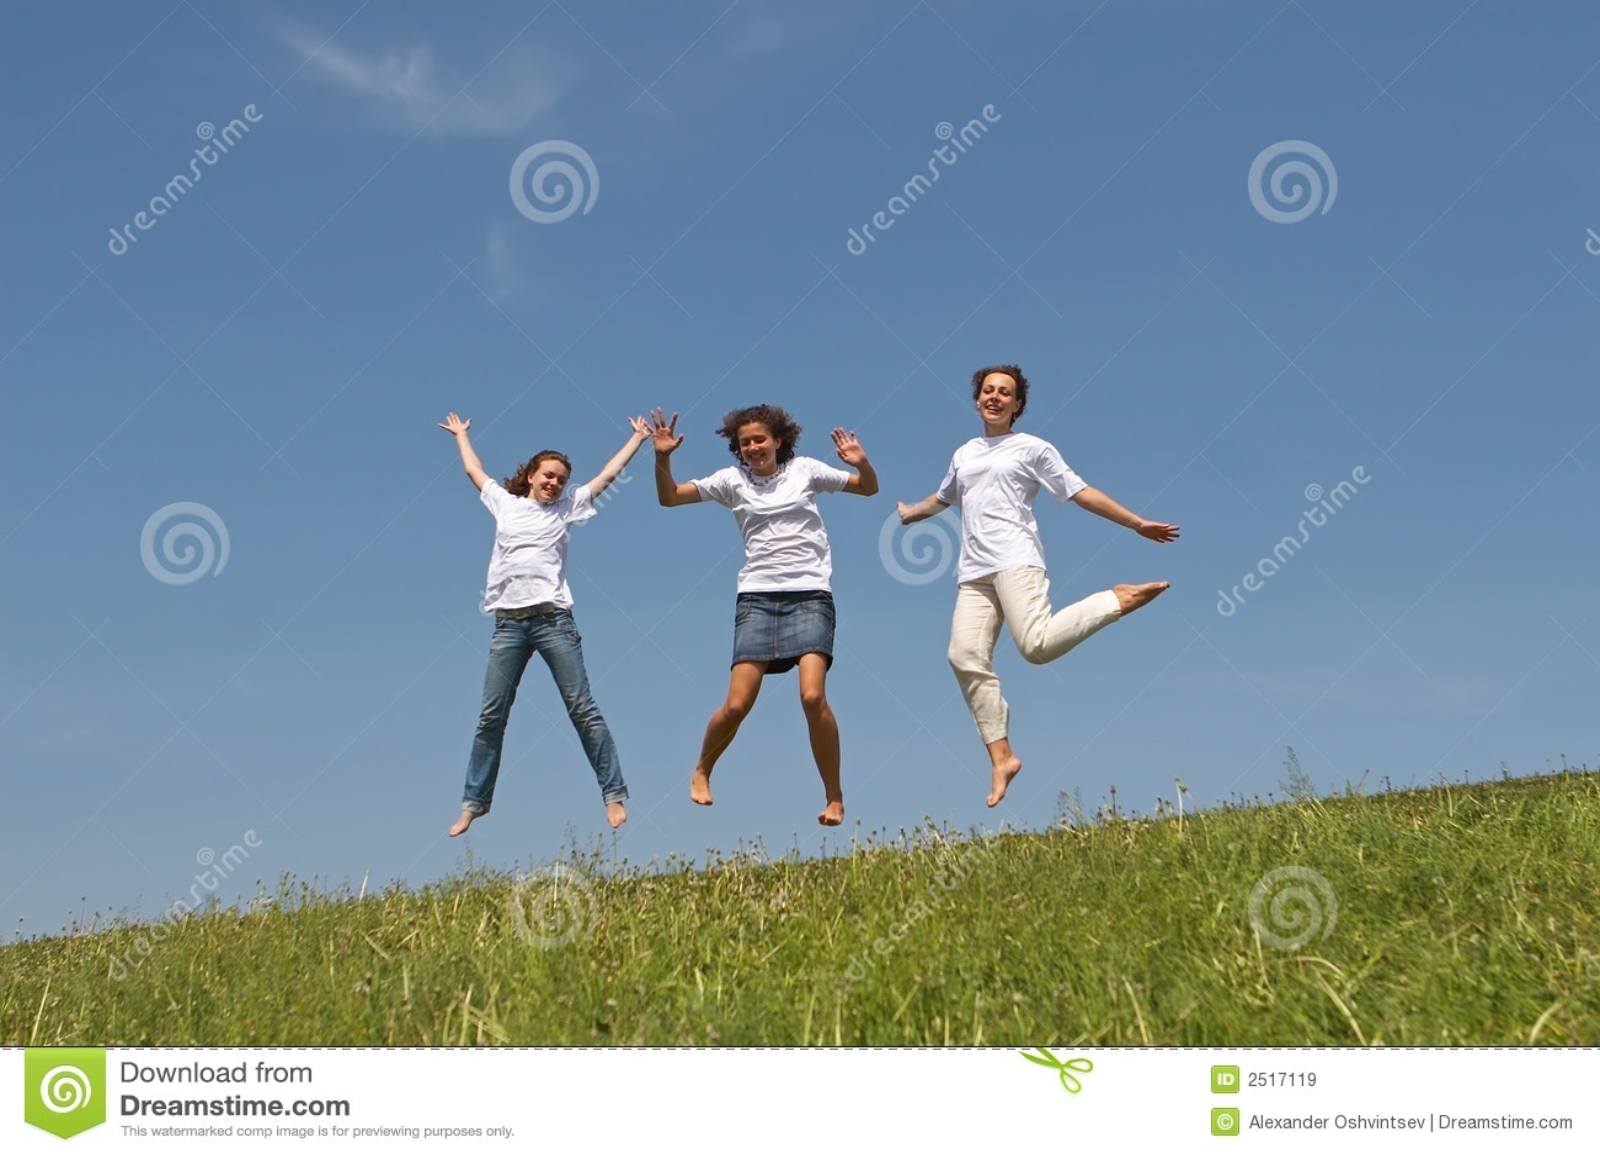 Jumps 3